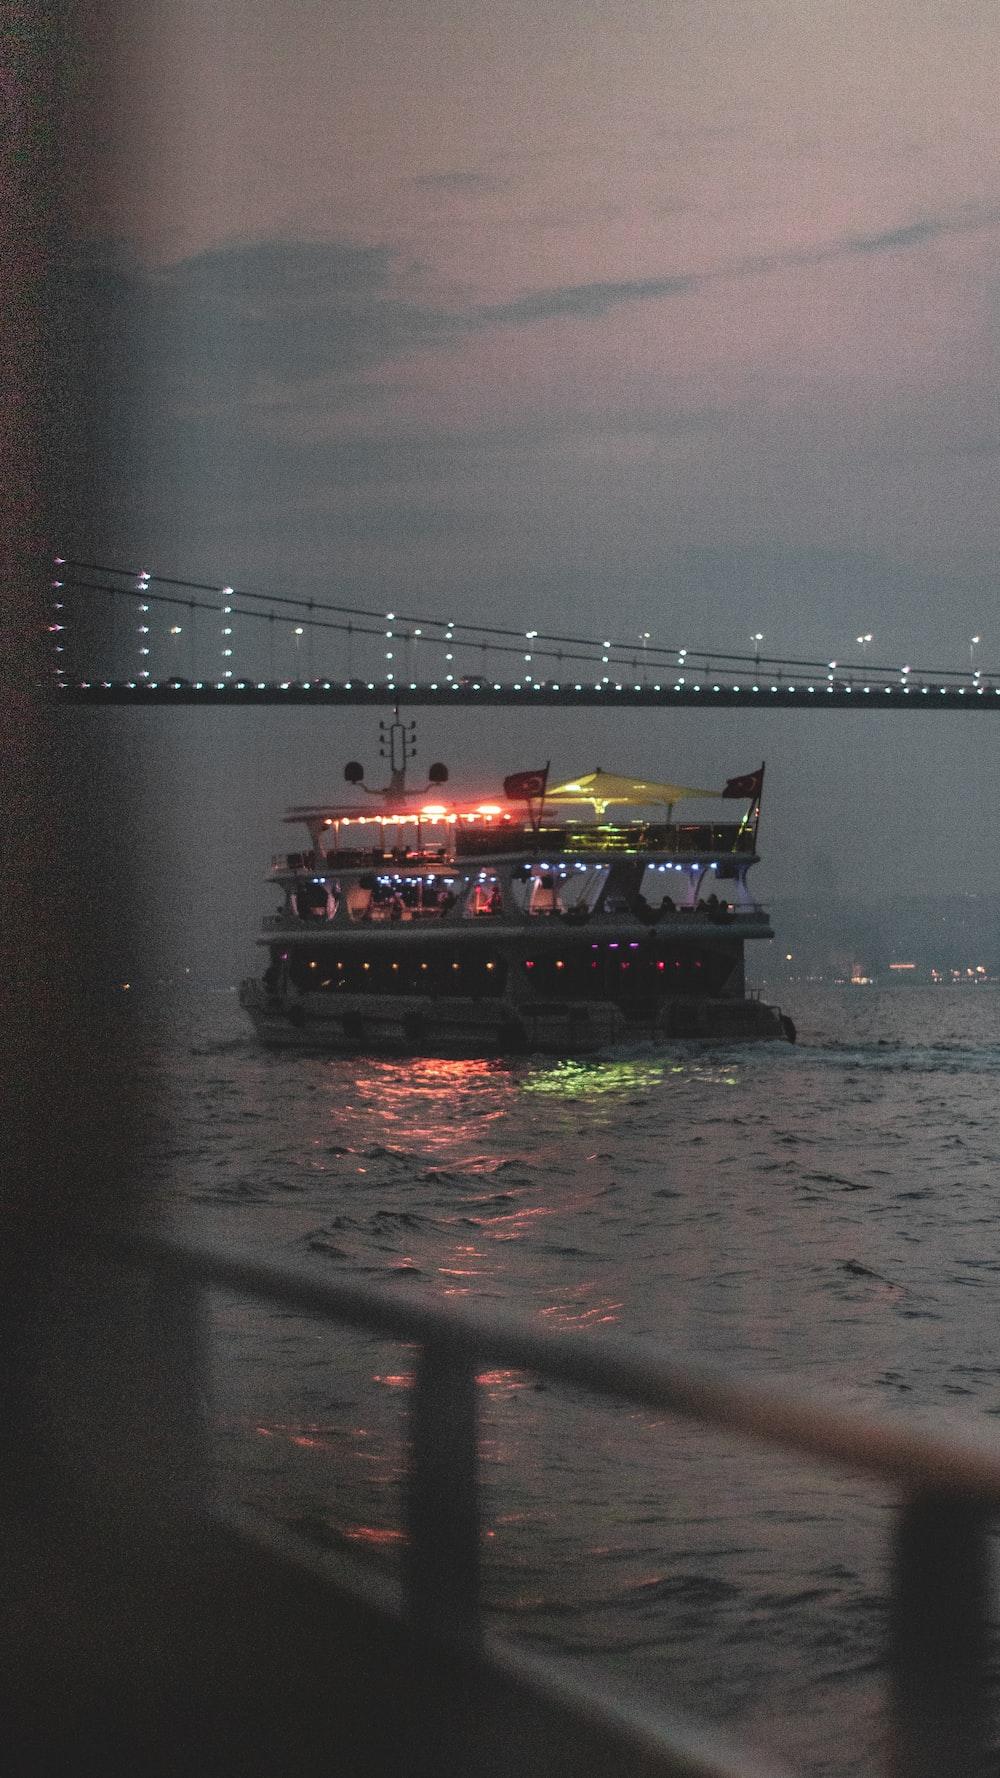 cruise ship under bridge